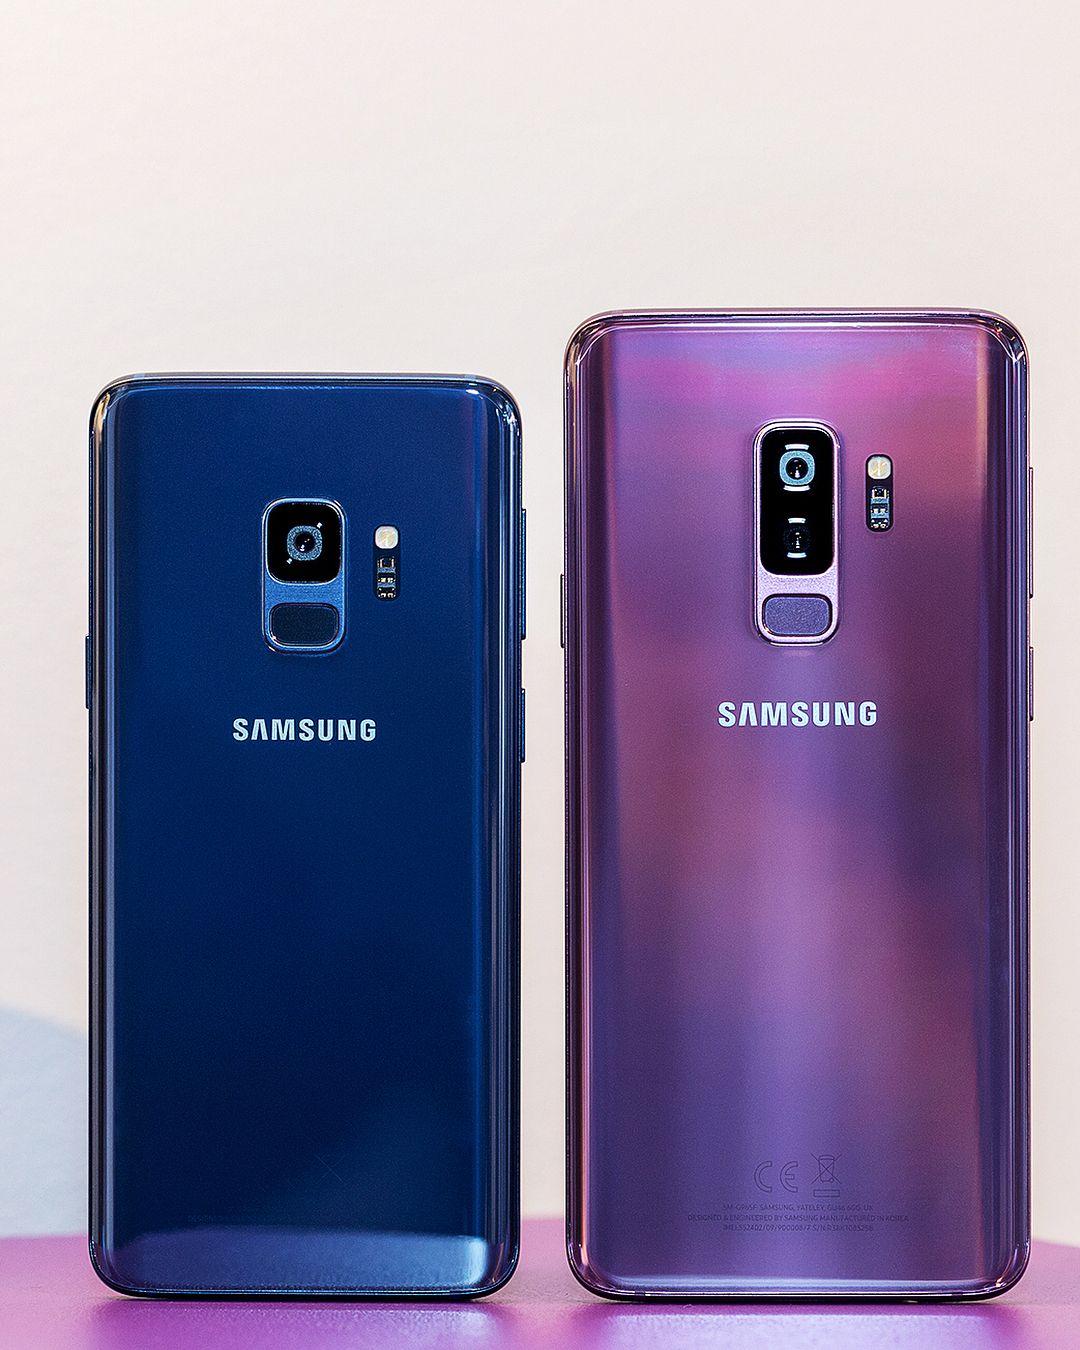 SAMSUNG GALAXY S9 & S9 Plus | Techere in 2019 | Samsung galaxy s9